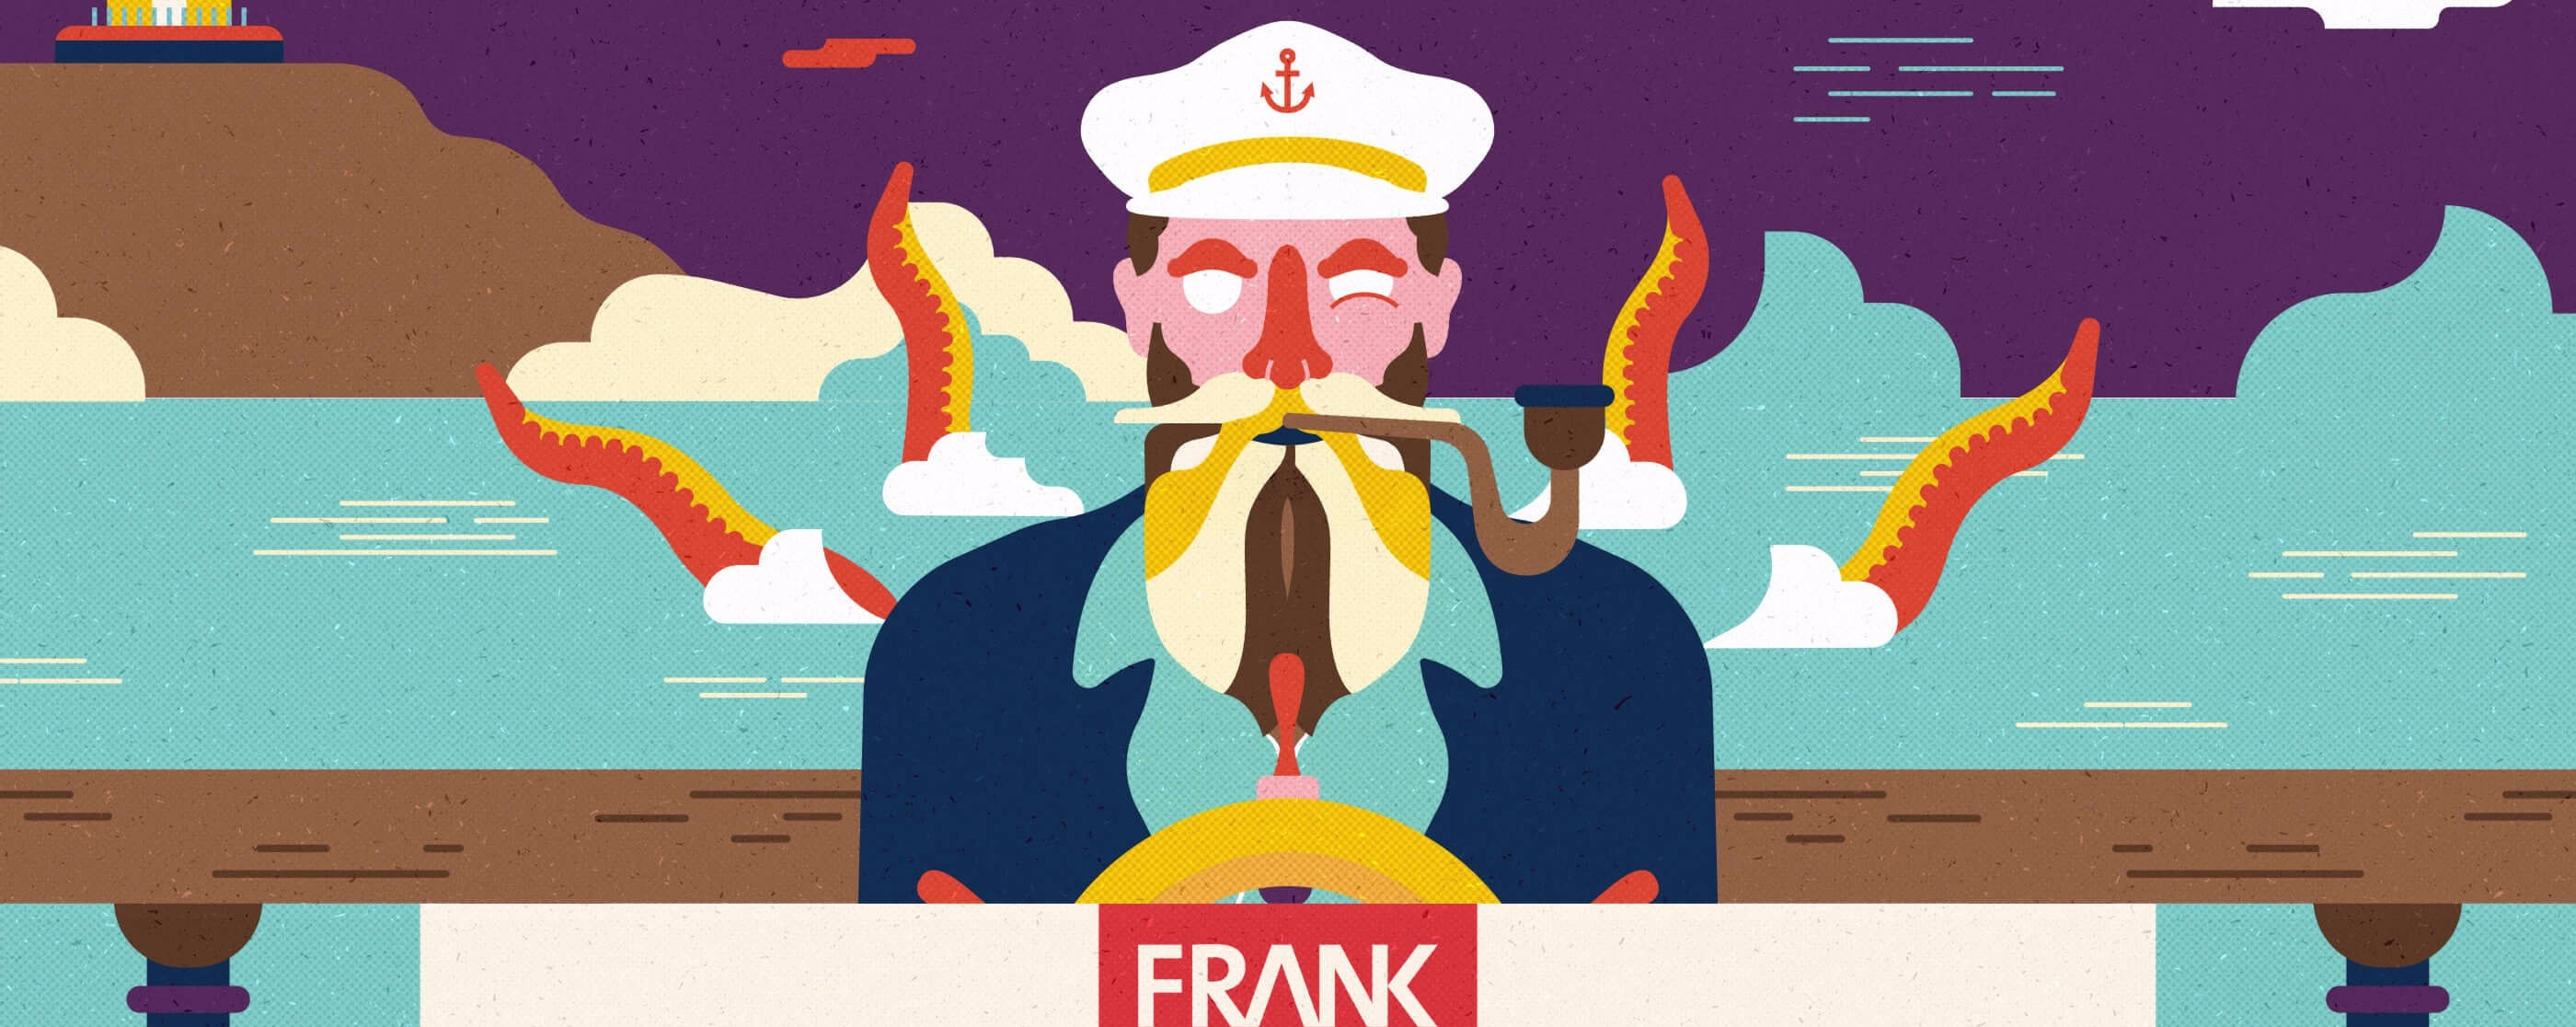 FRANK Presents: Bandwagon Riverboat II